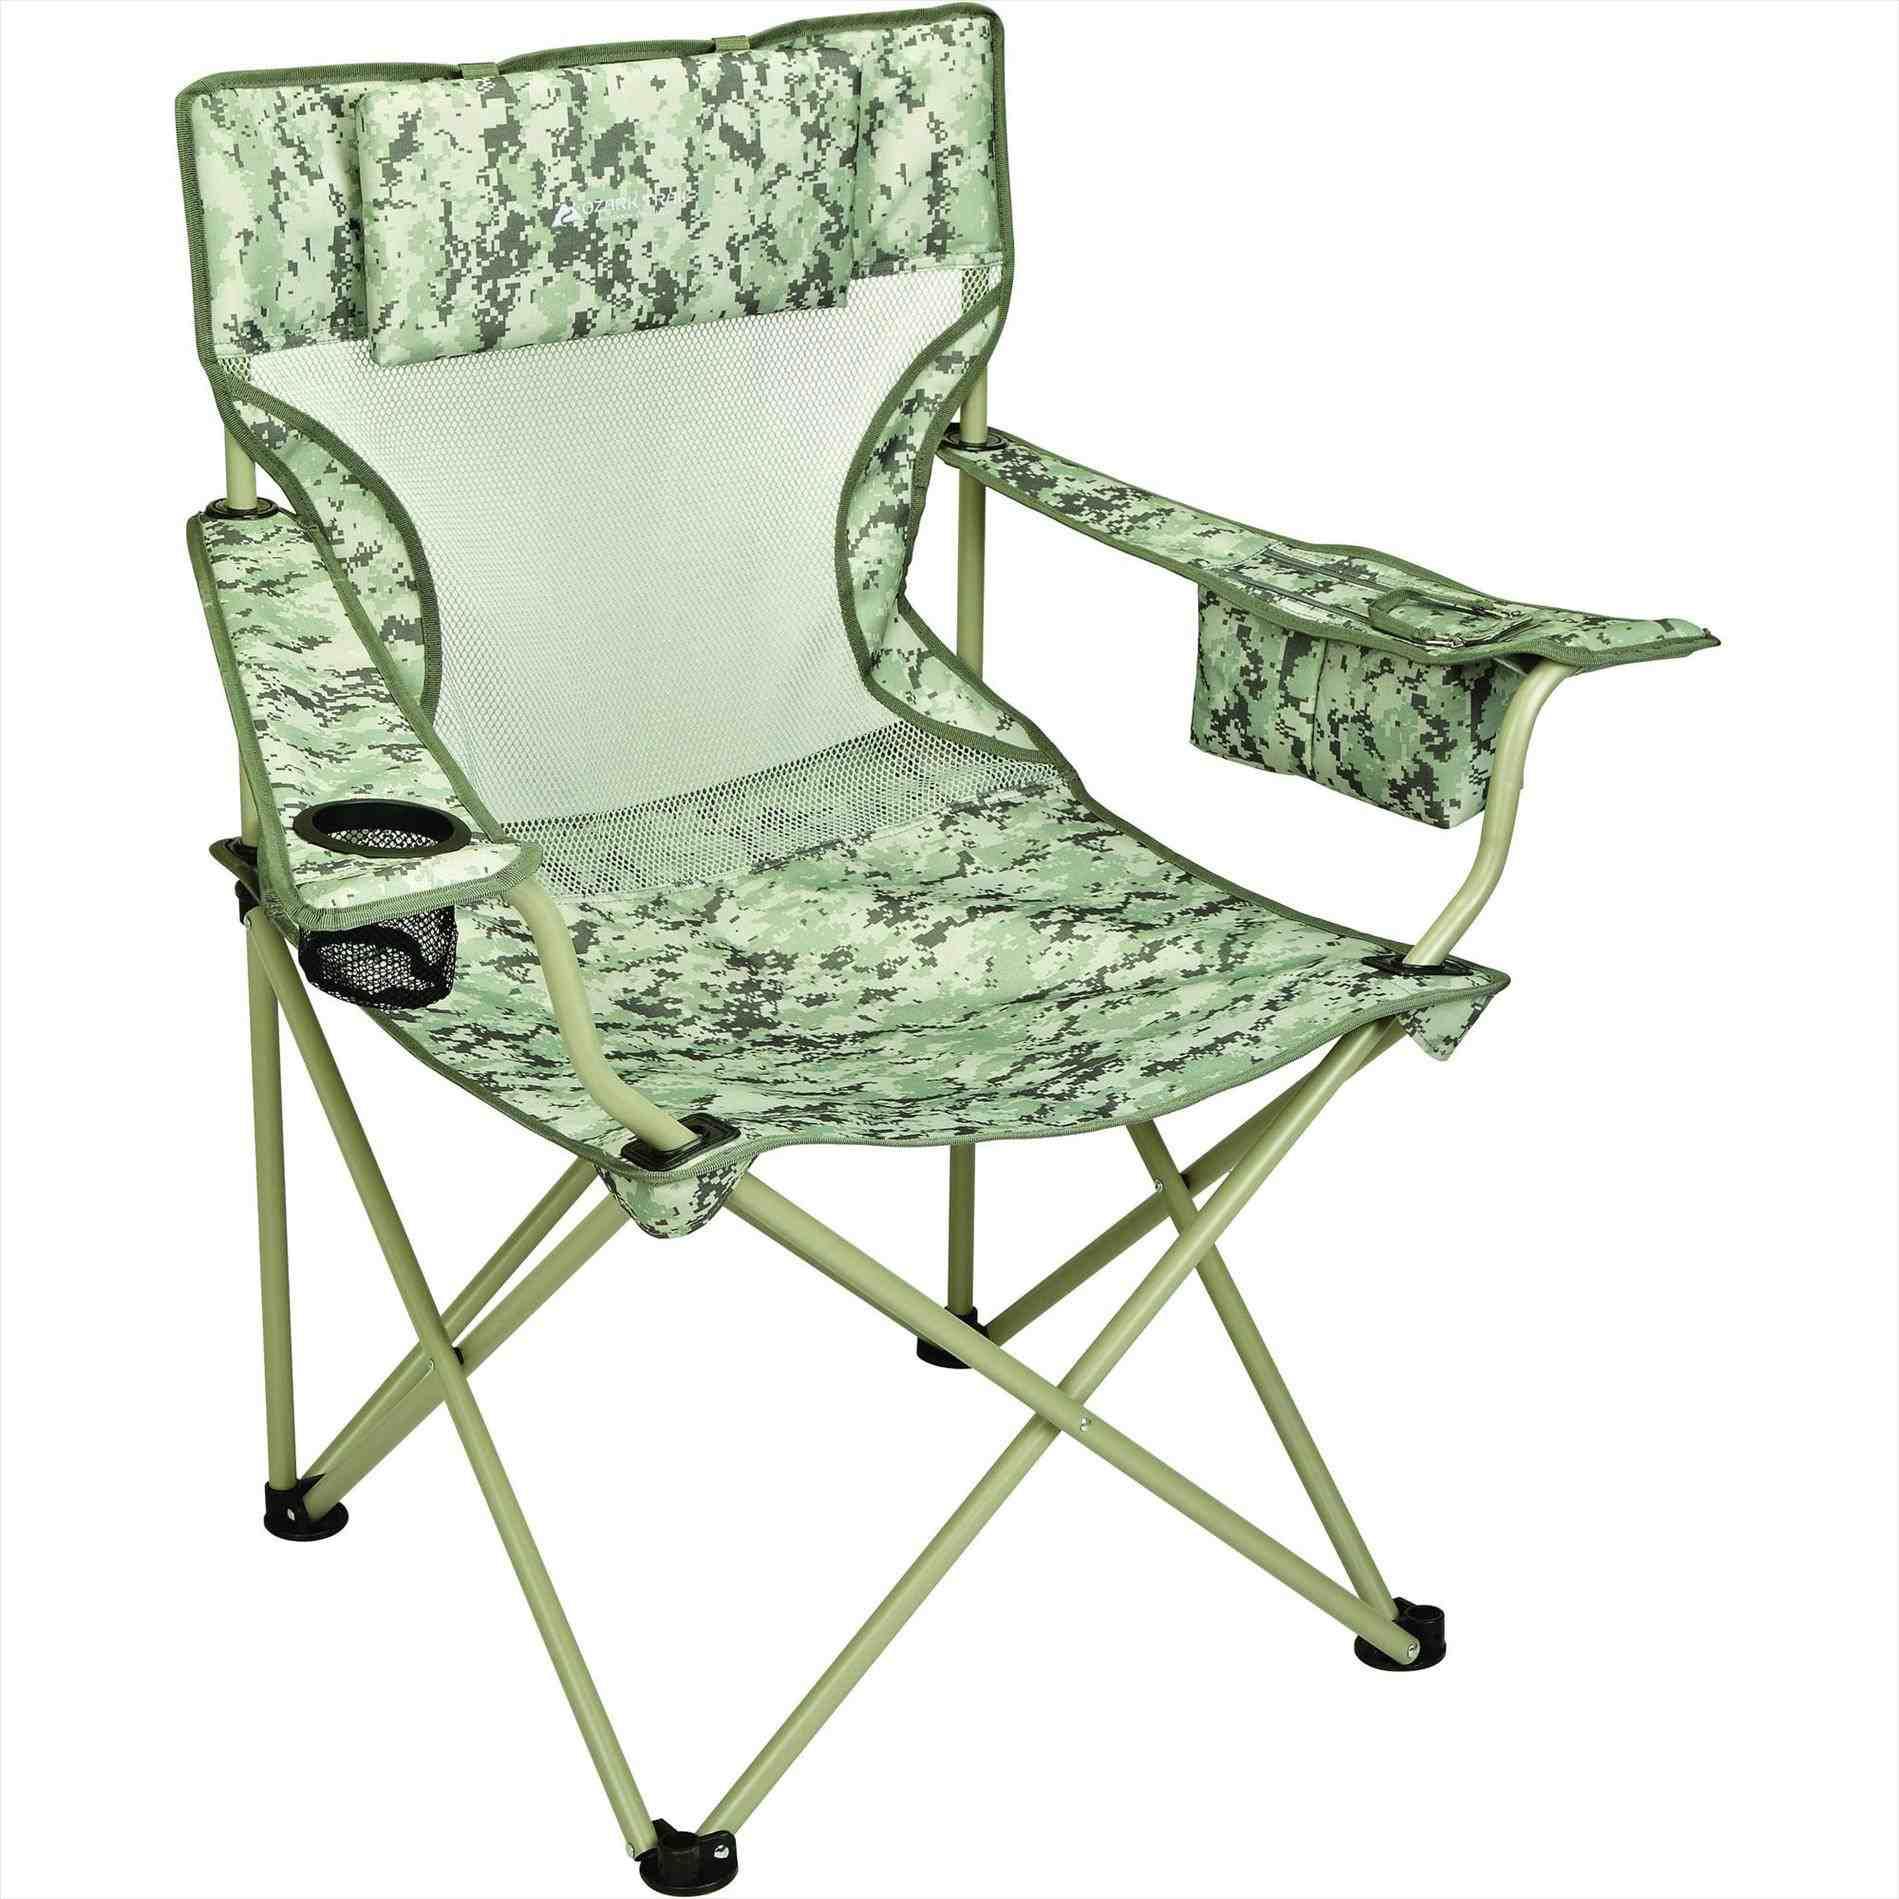 1899x1899 Beach Lawn Chairs Clipart Chair Drawing Sadgururockscom Com